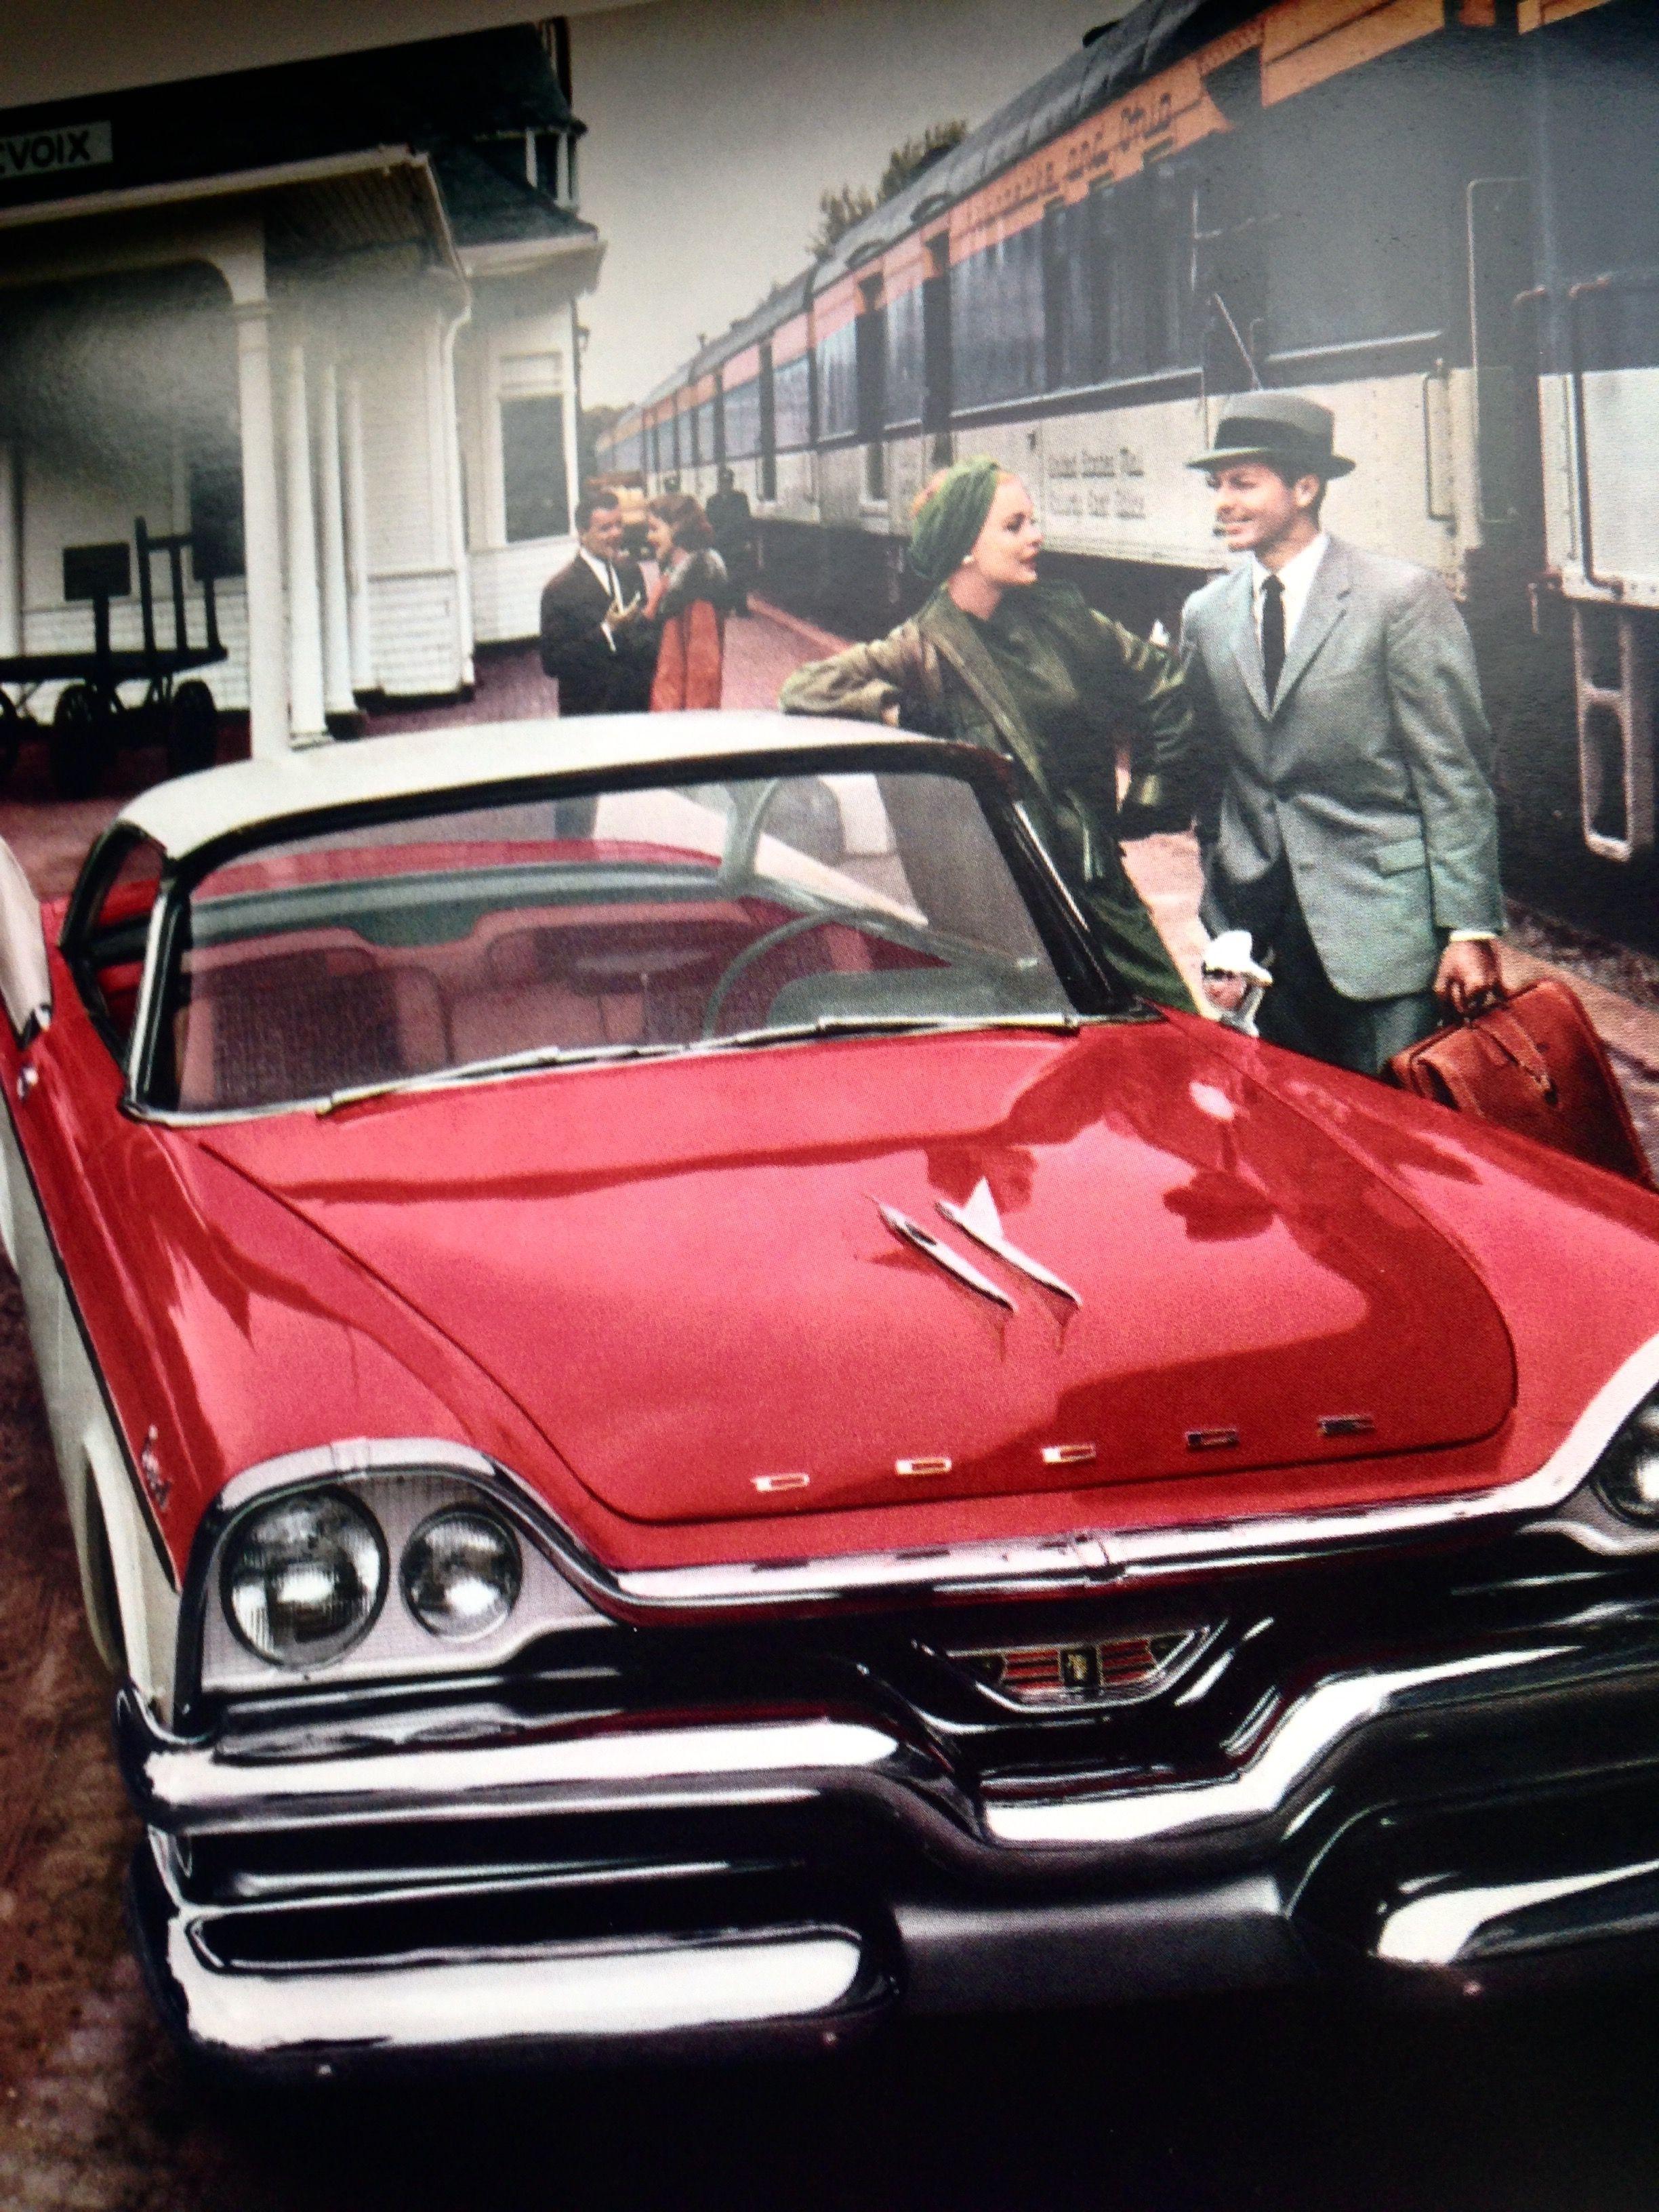 1957 Dodge Coronet Lancer Hardtop At The Railway Station 1950s Cars